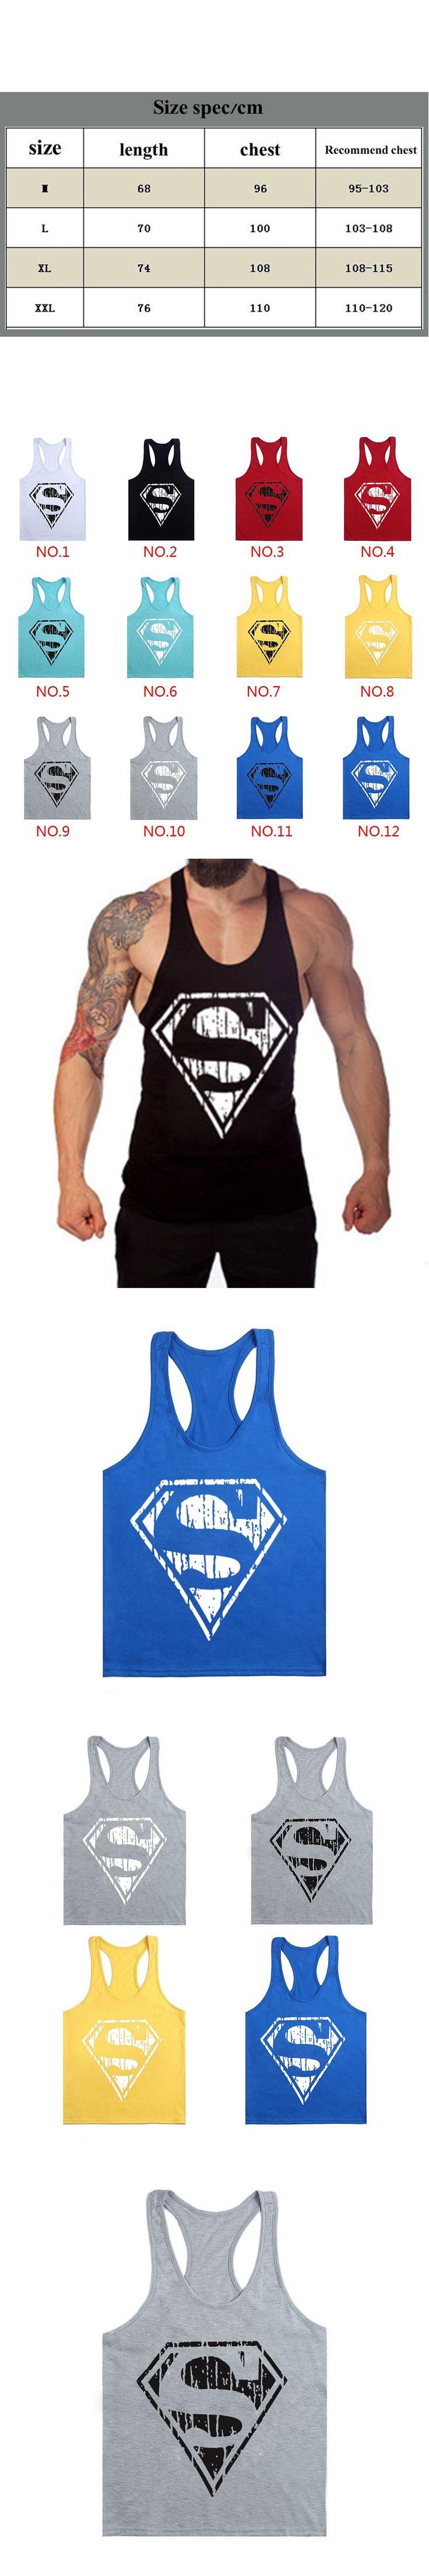 Men Singlets Jersey Slim Fit Cotton Low Cut Tank Tops Male Bodybuilding Clothing Vest Tops Undershirt Good Quality Wholesale